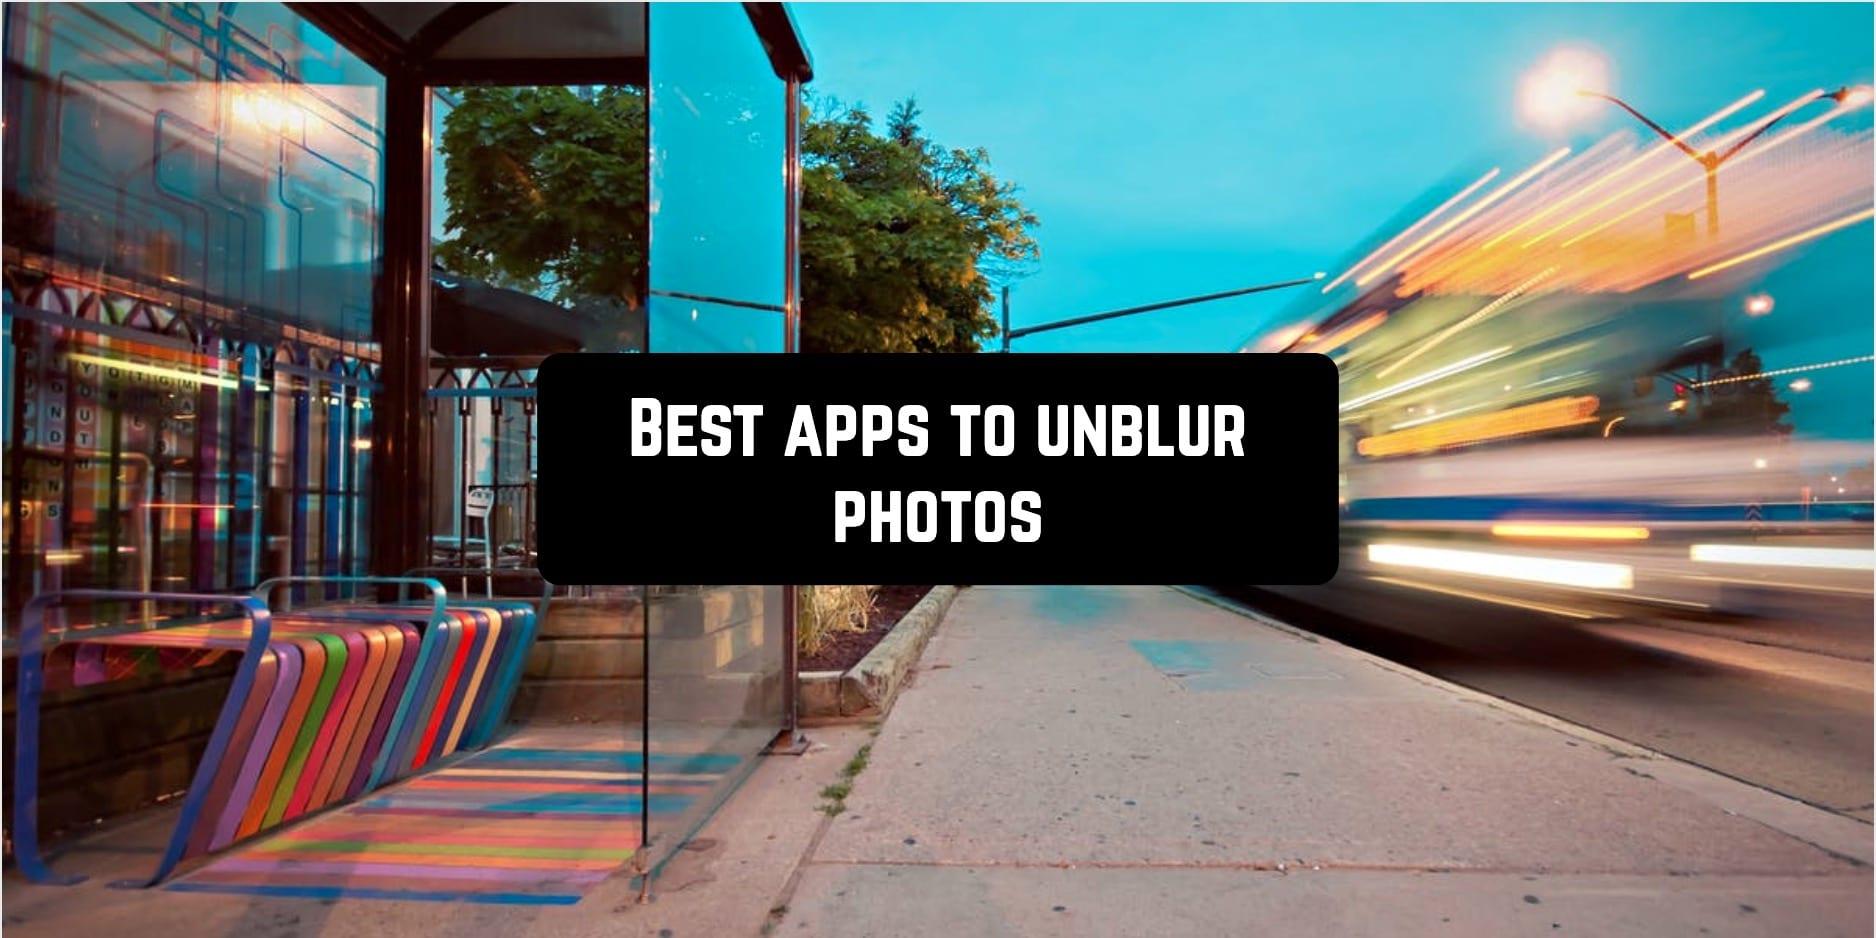 Best apps to unblur photos